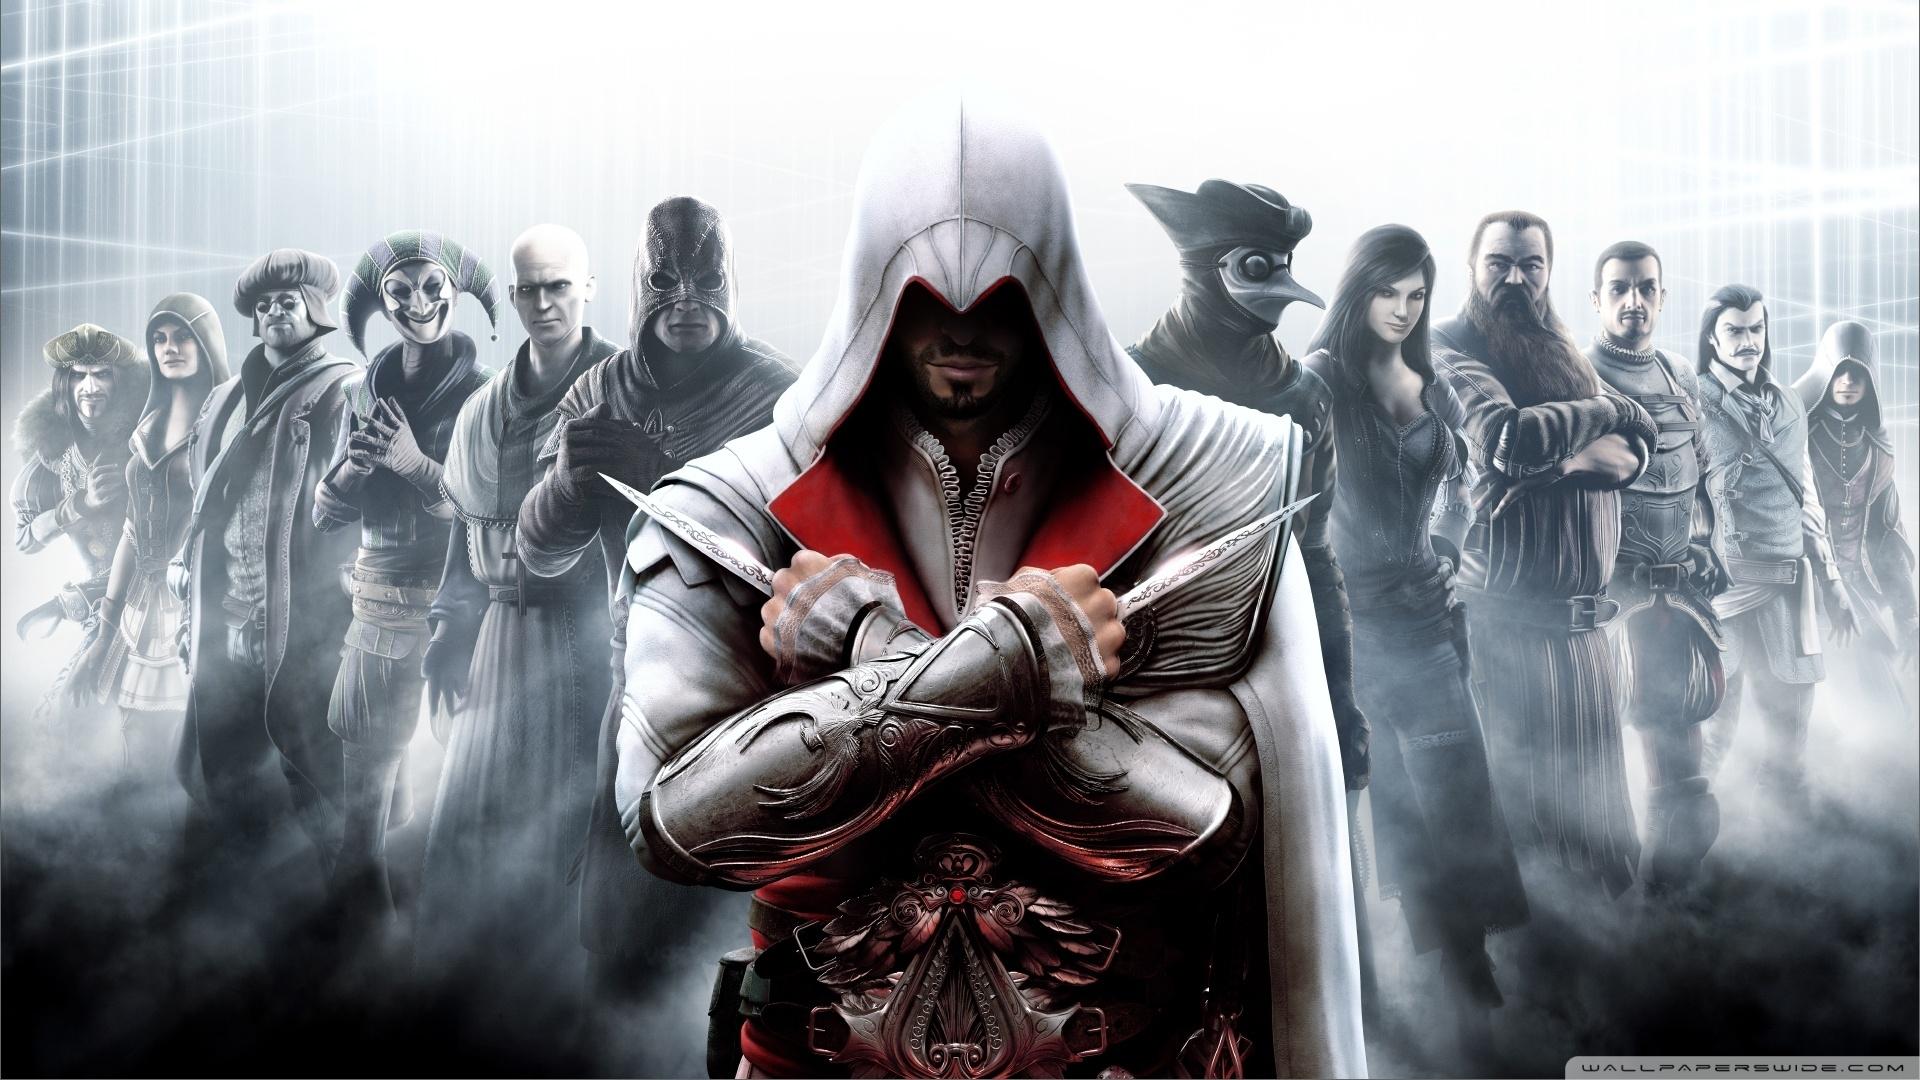 assassin's creed brotherhood ❤ 4k hd desktop wallpaper for 4k ultra